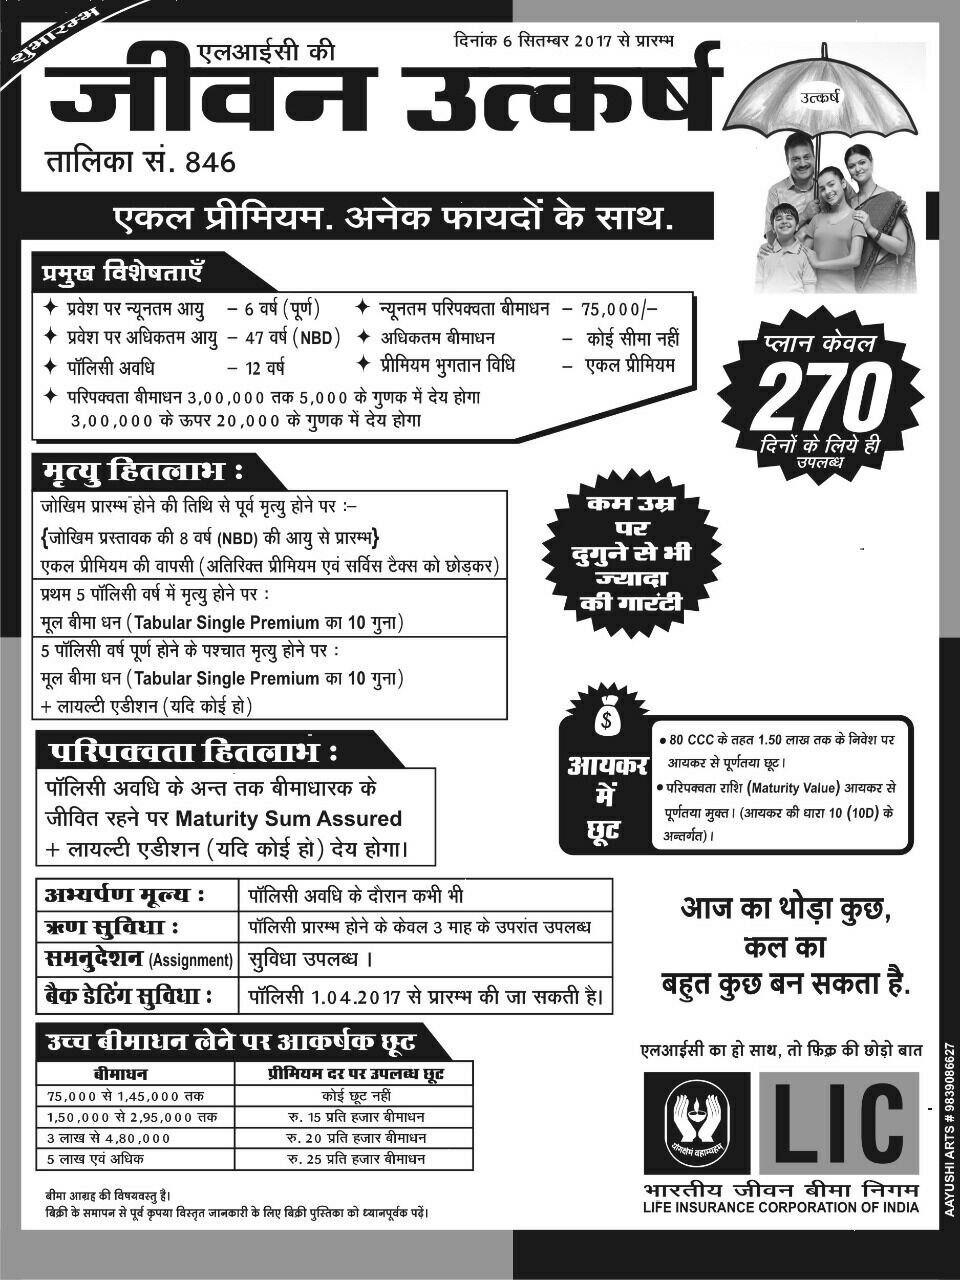 LIC JEEVAN UTKARSH SINGLE PREMIUM PLAN No. 846 Chart in Hindi